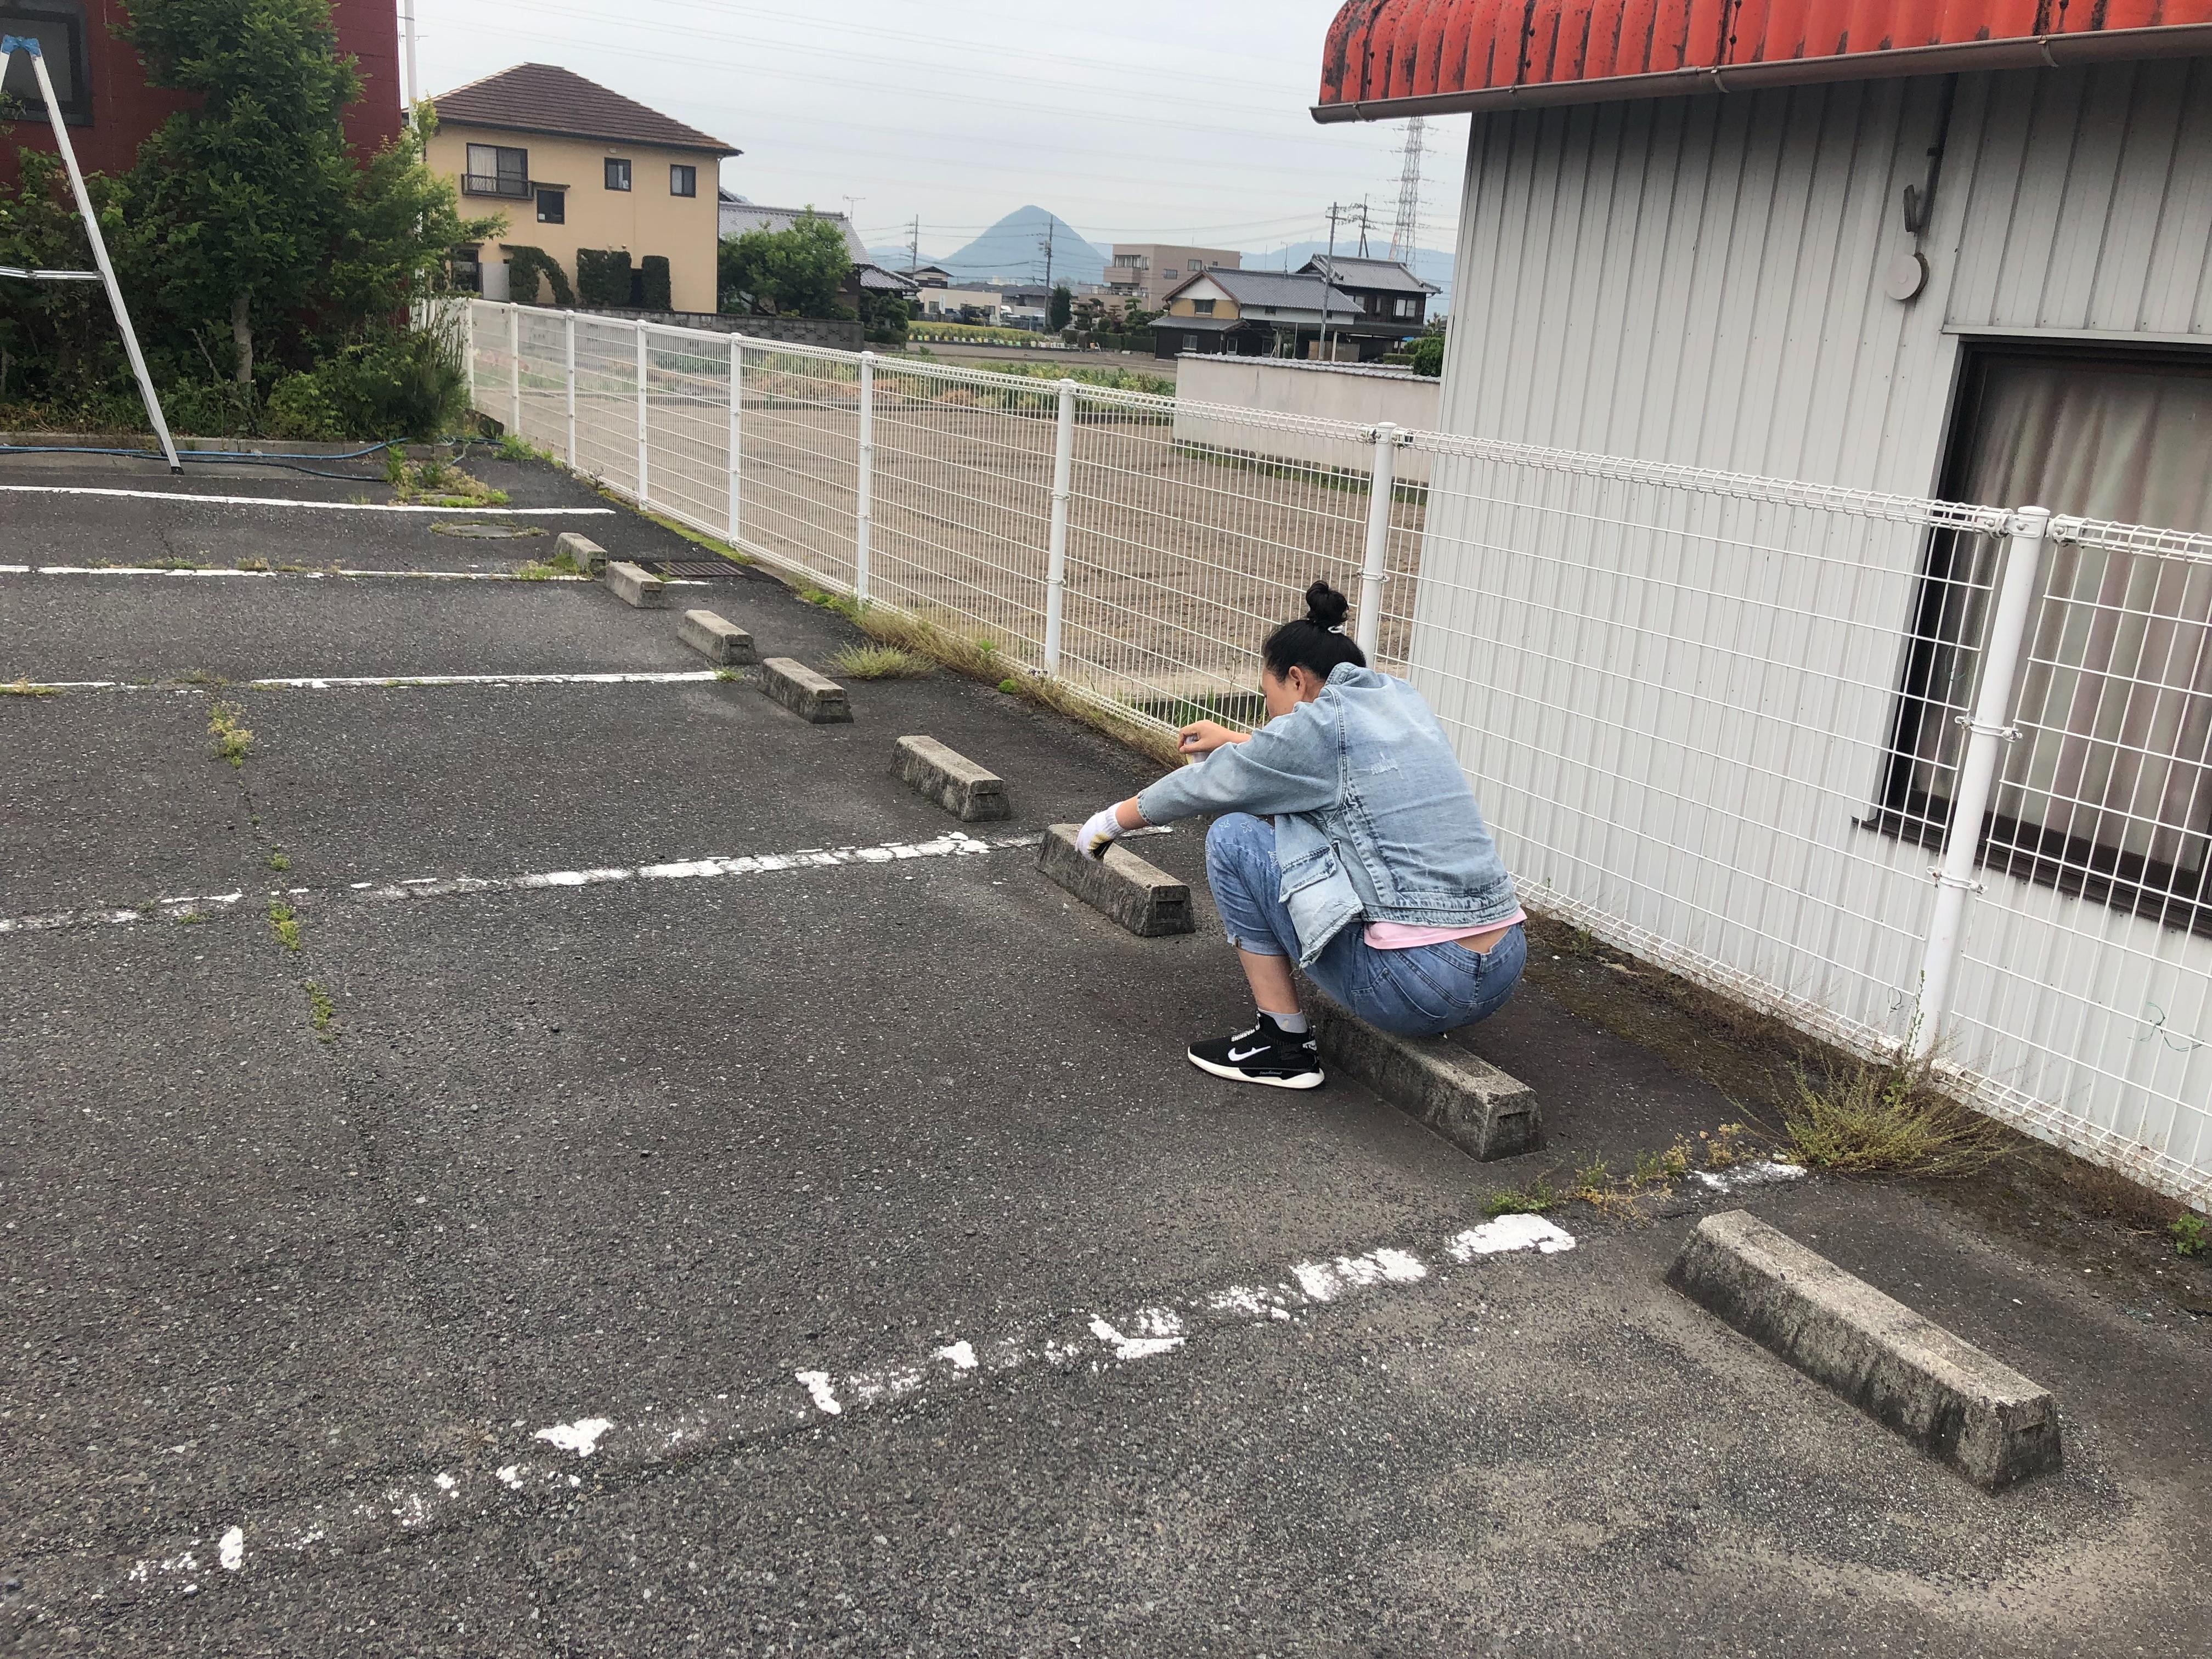 f:id:masanori-kato1972:20190509200559j:image